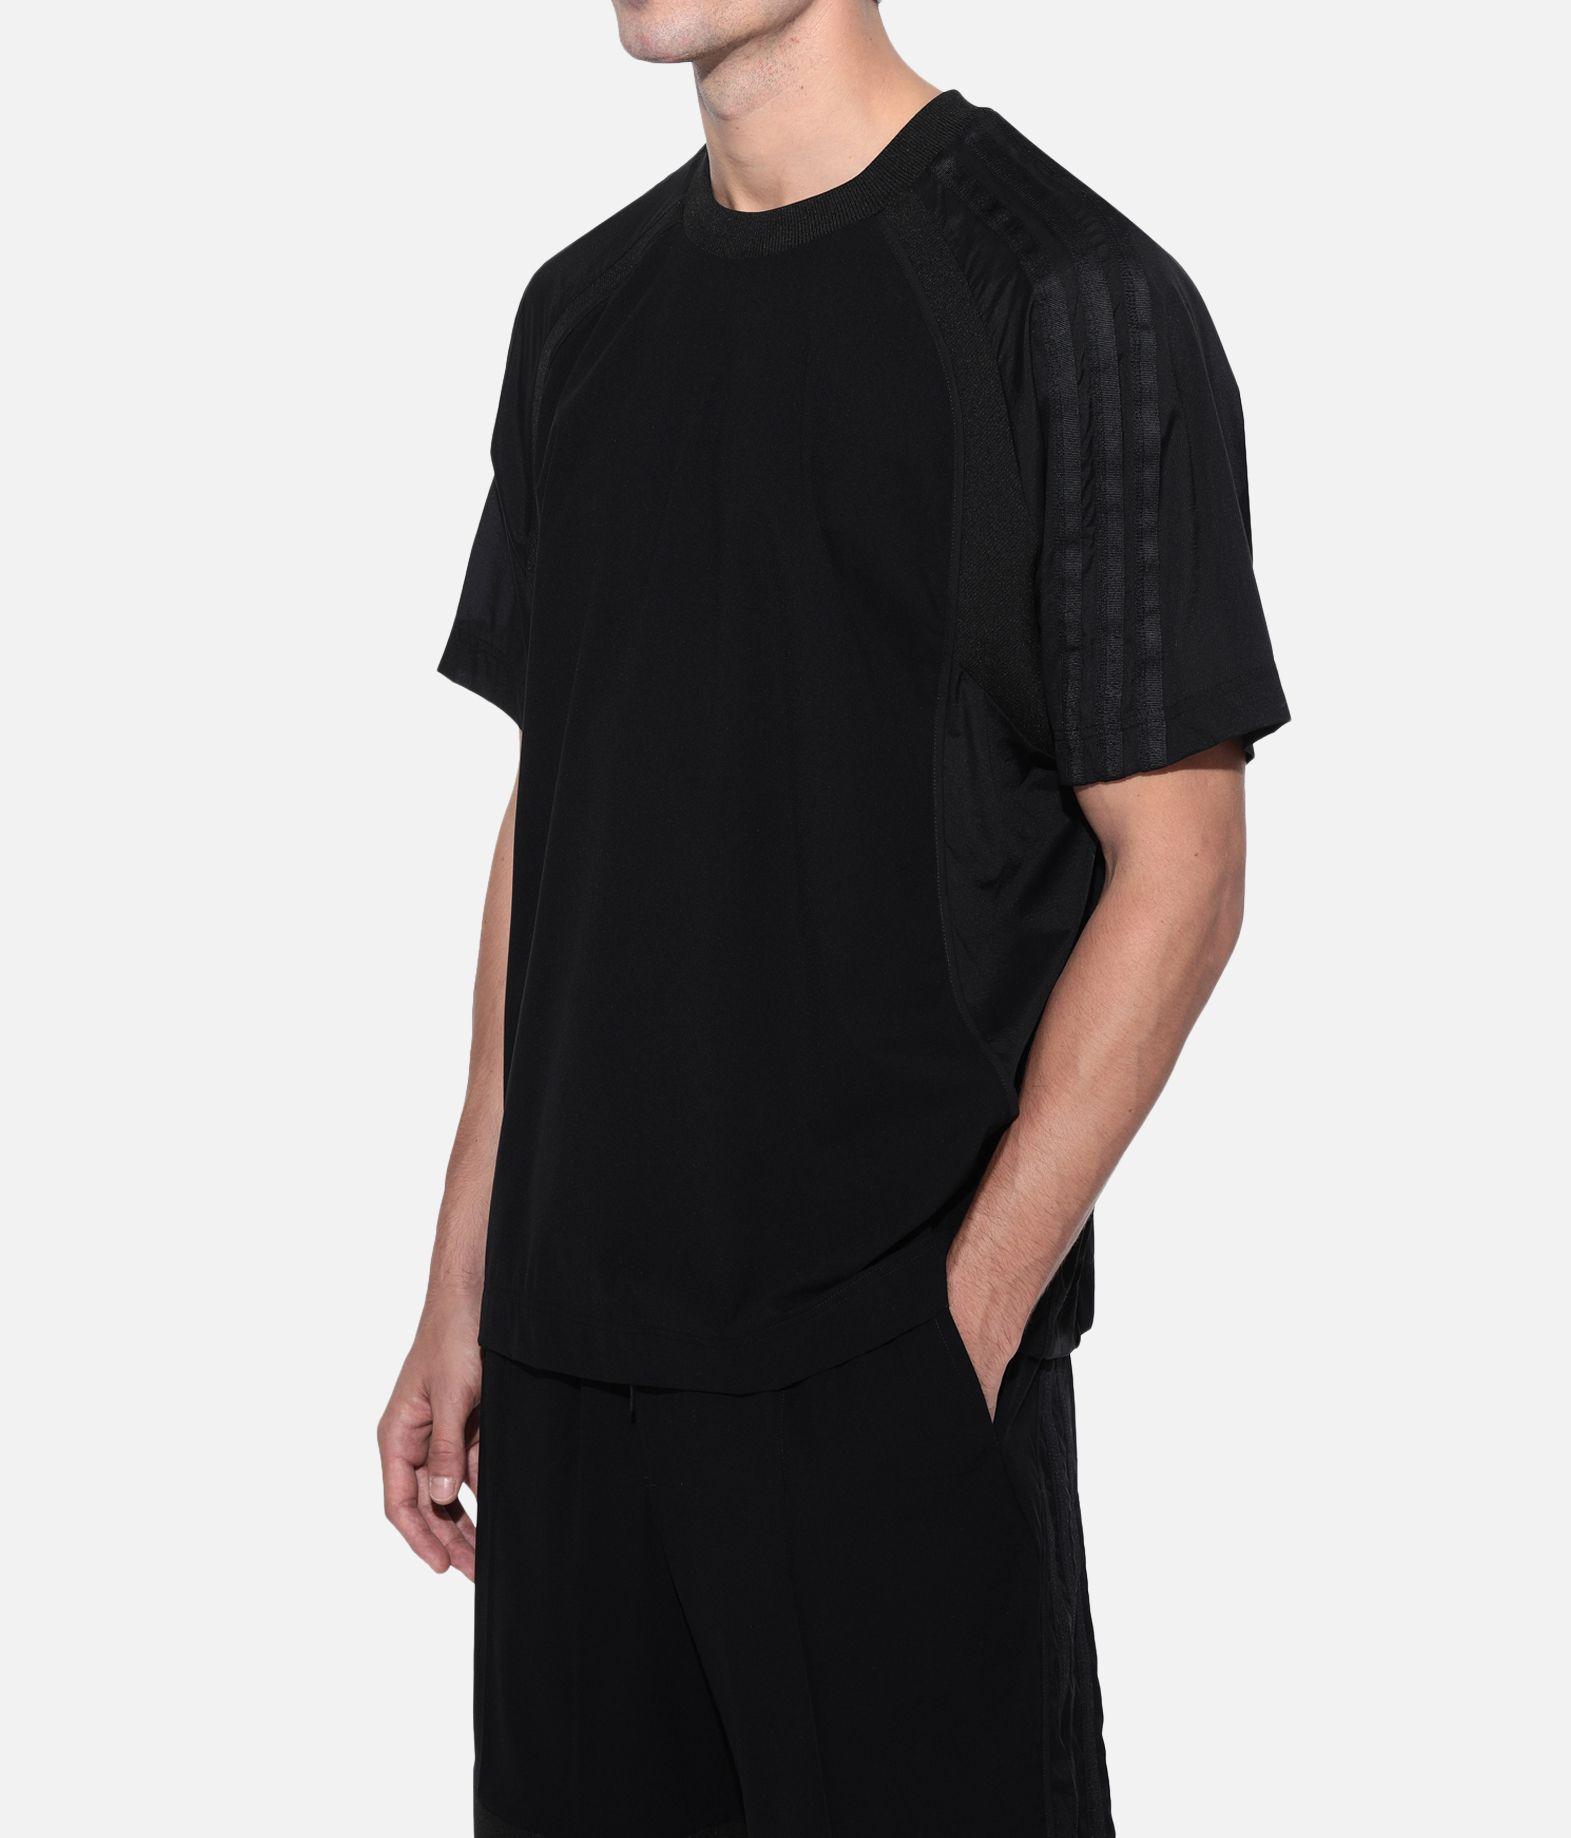 Y-3 Y-3 3-Stripes Material Mix Tee T-shirt maniche corte Uomo e